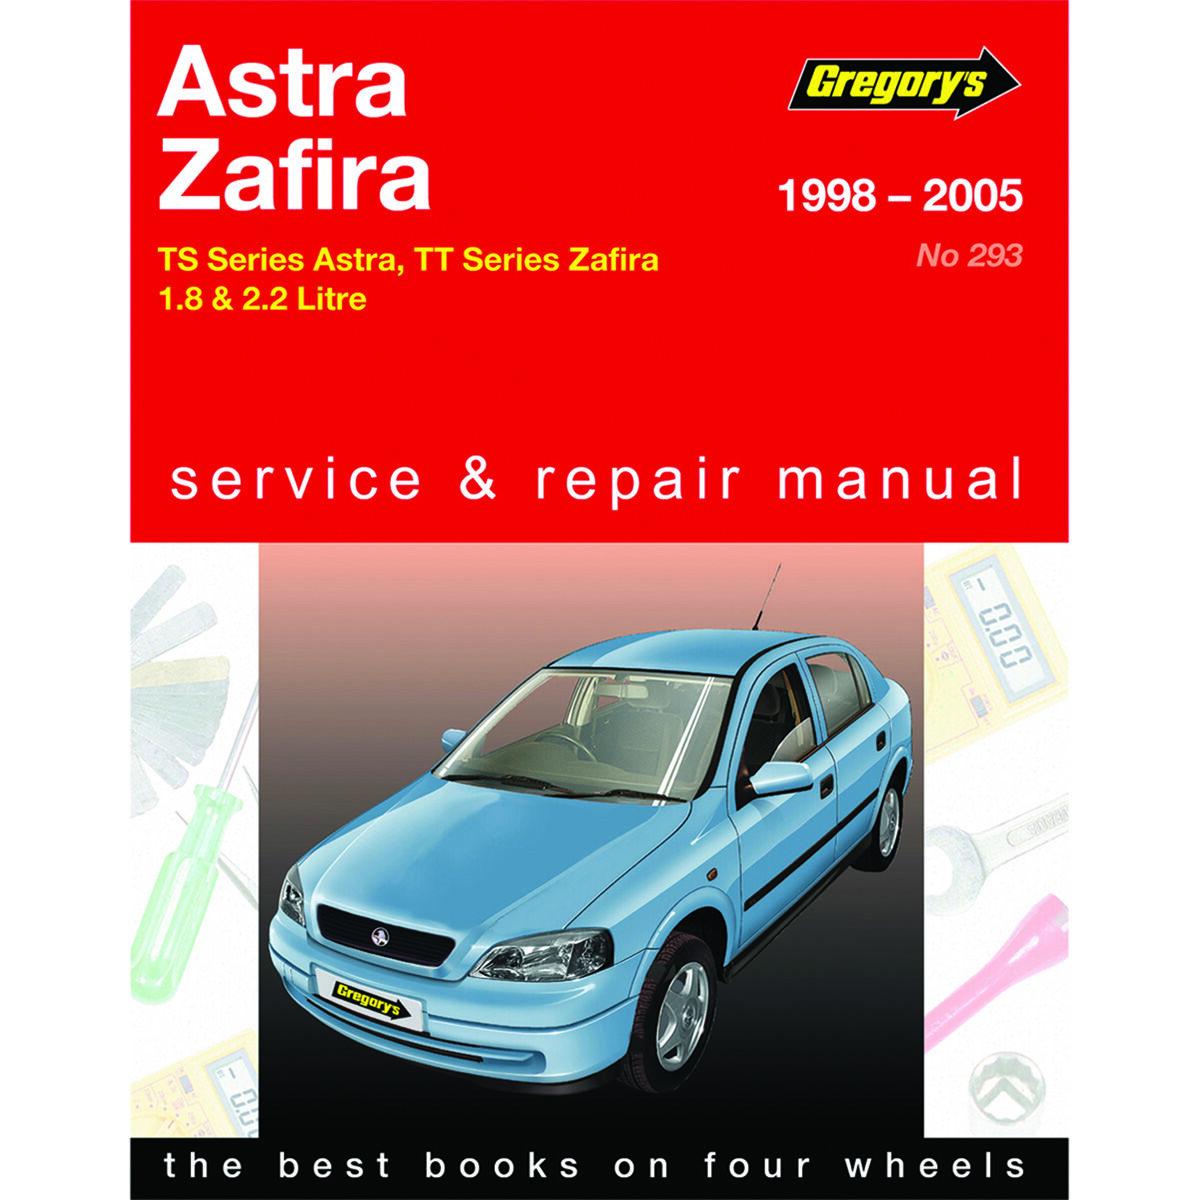 car manual for holden astra zafira 1998 2005 293 supercheap auto rh supercheapauto com au 2004 Holden Astra holden astra ts workshop manual pdf